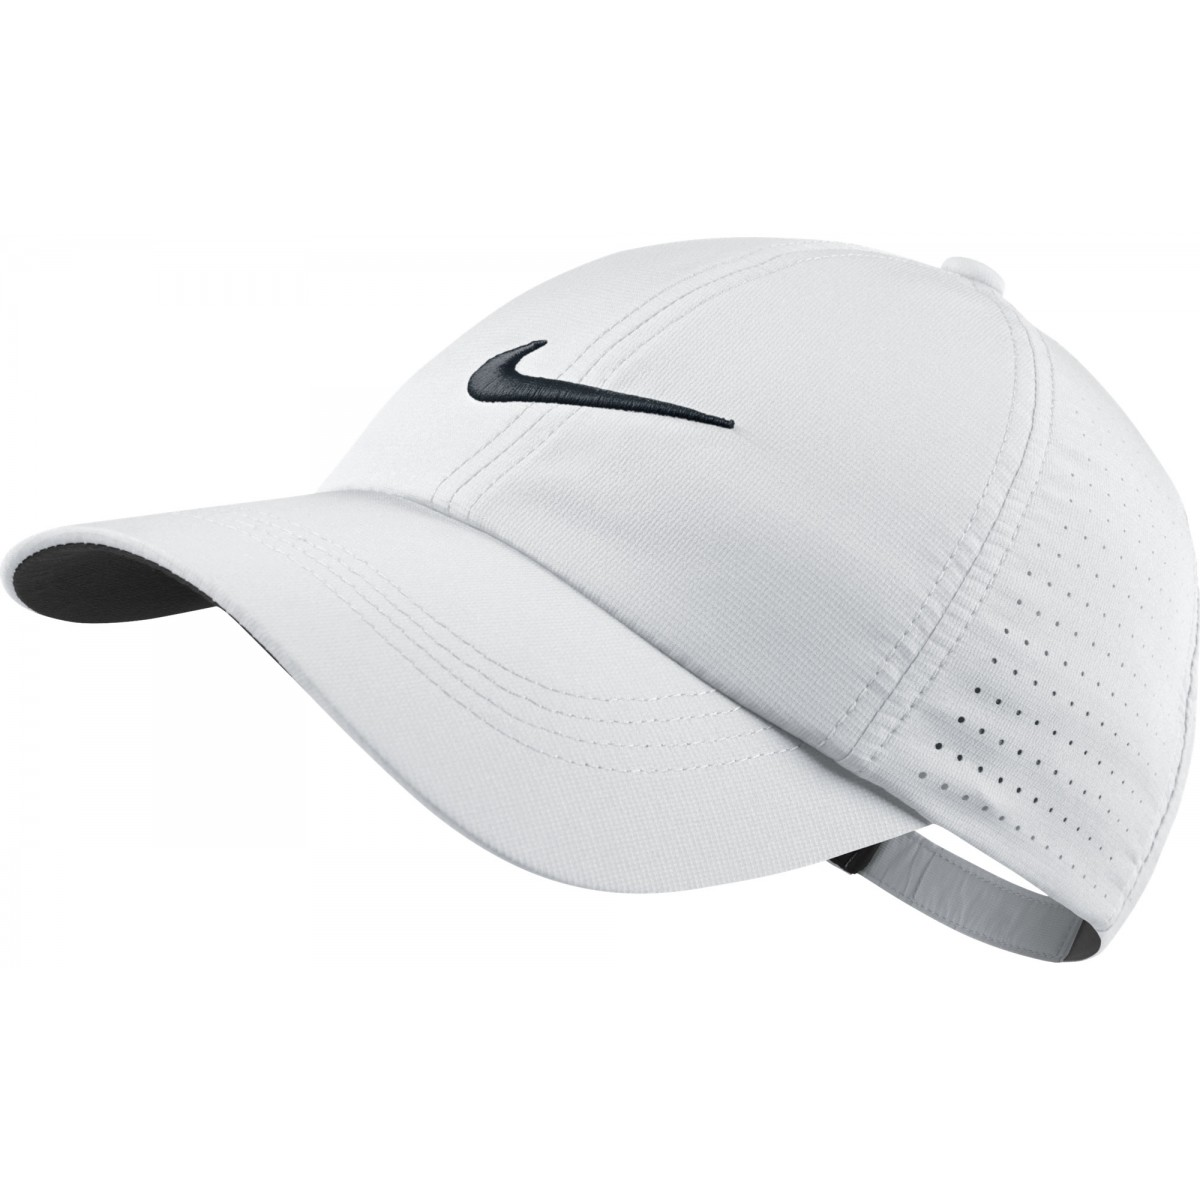 Nike Golf Junior Dri-Fit Perf Hat - Carl's Golfland